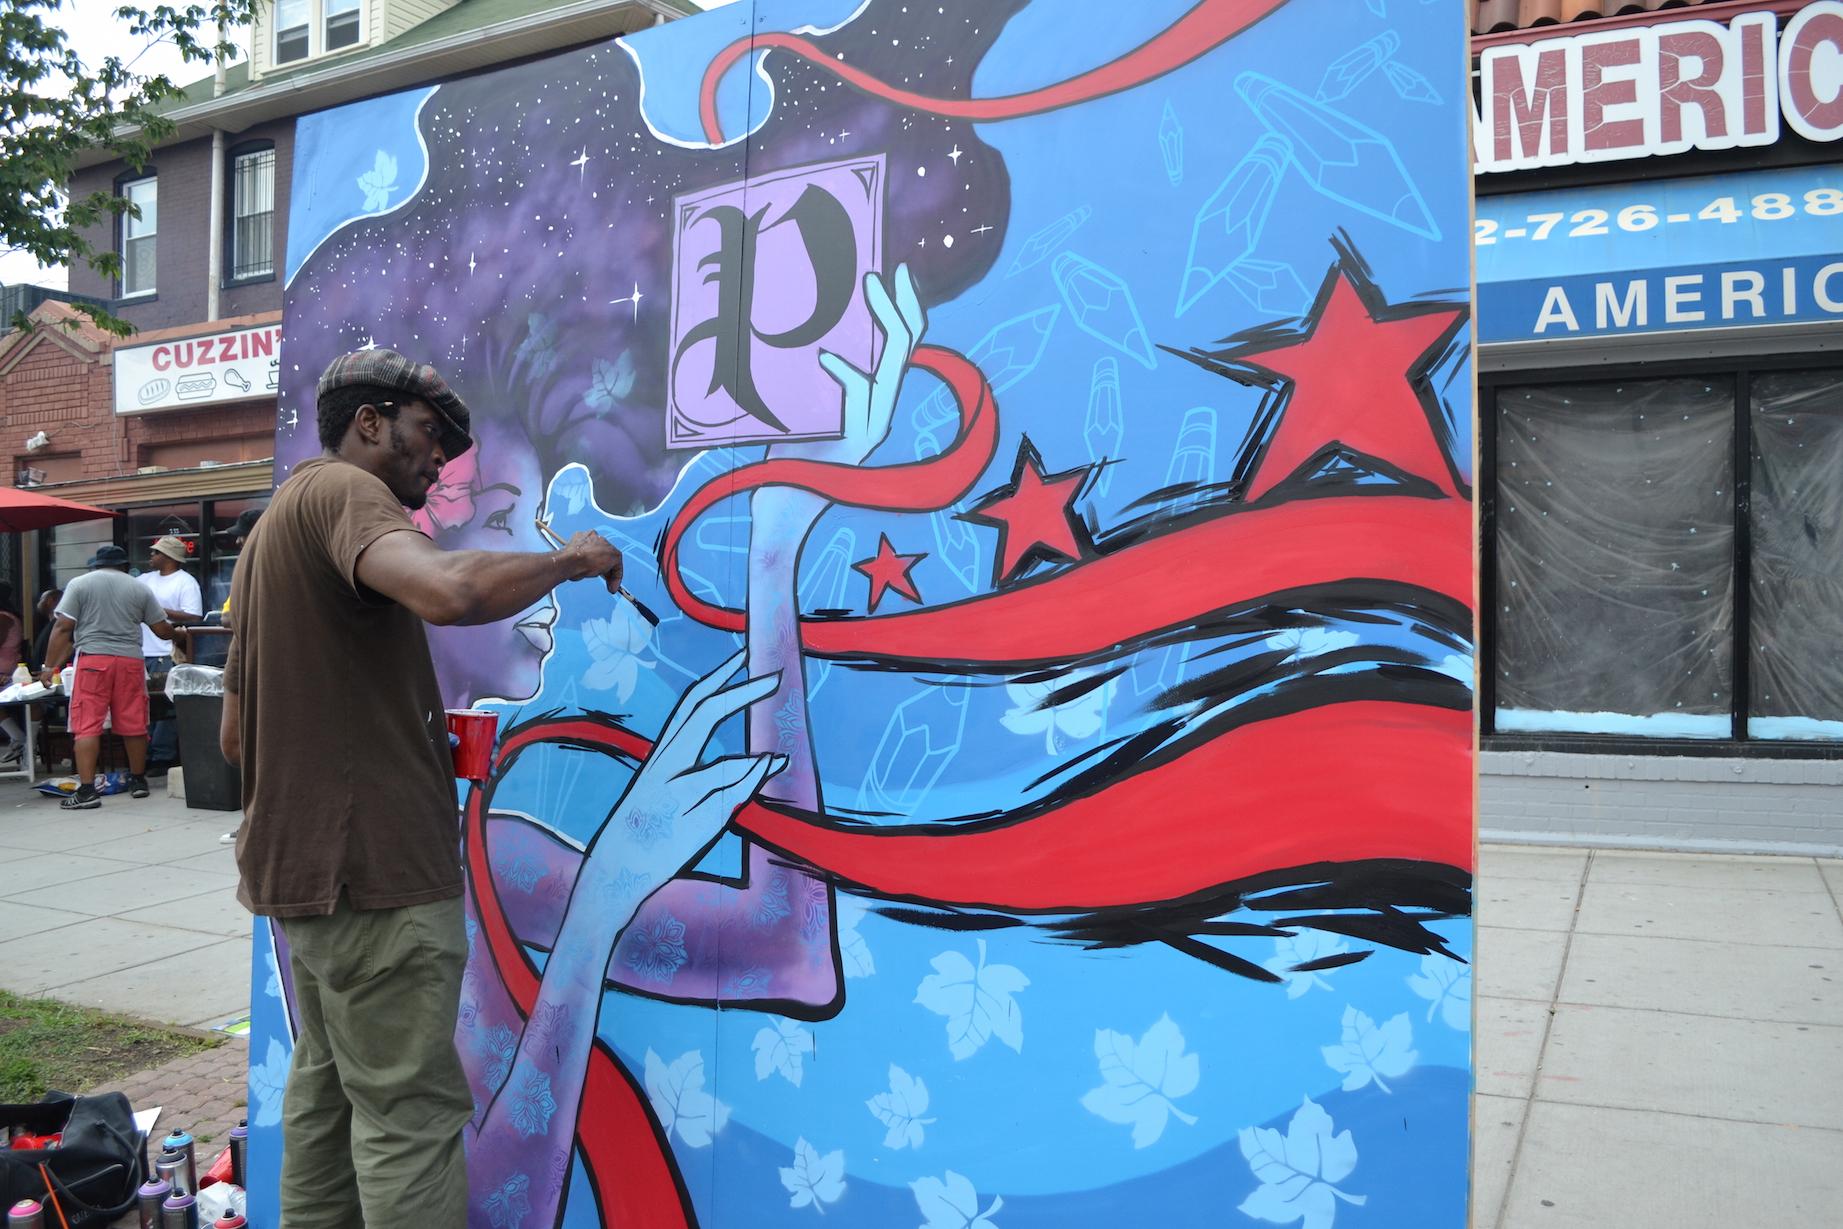 Aniekan Udofia painting an original work at the Festival ( http://www.aniekanudofia.com )